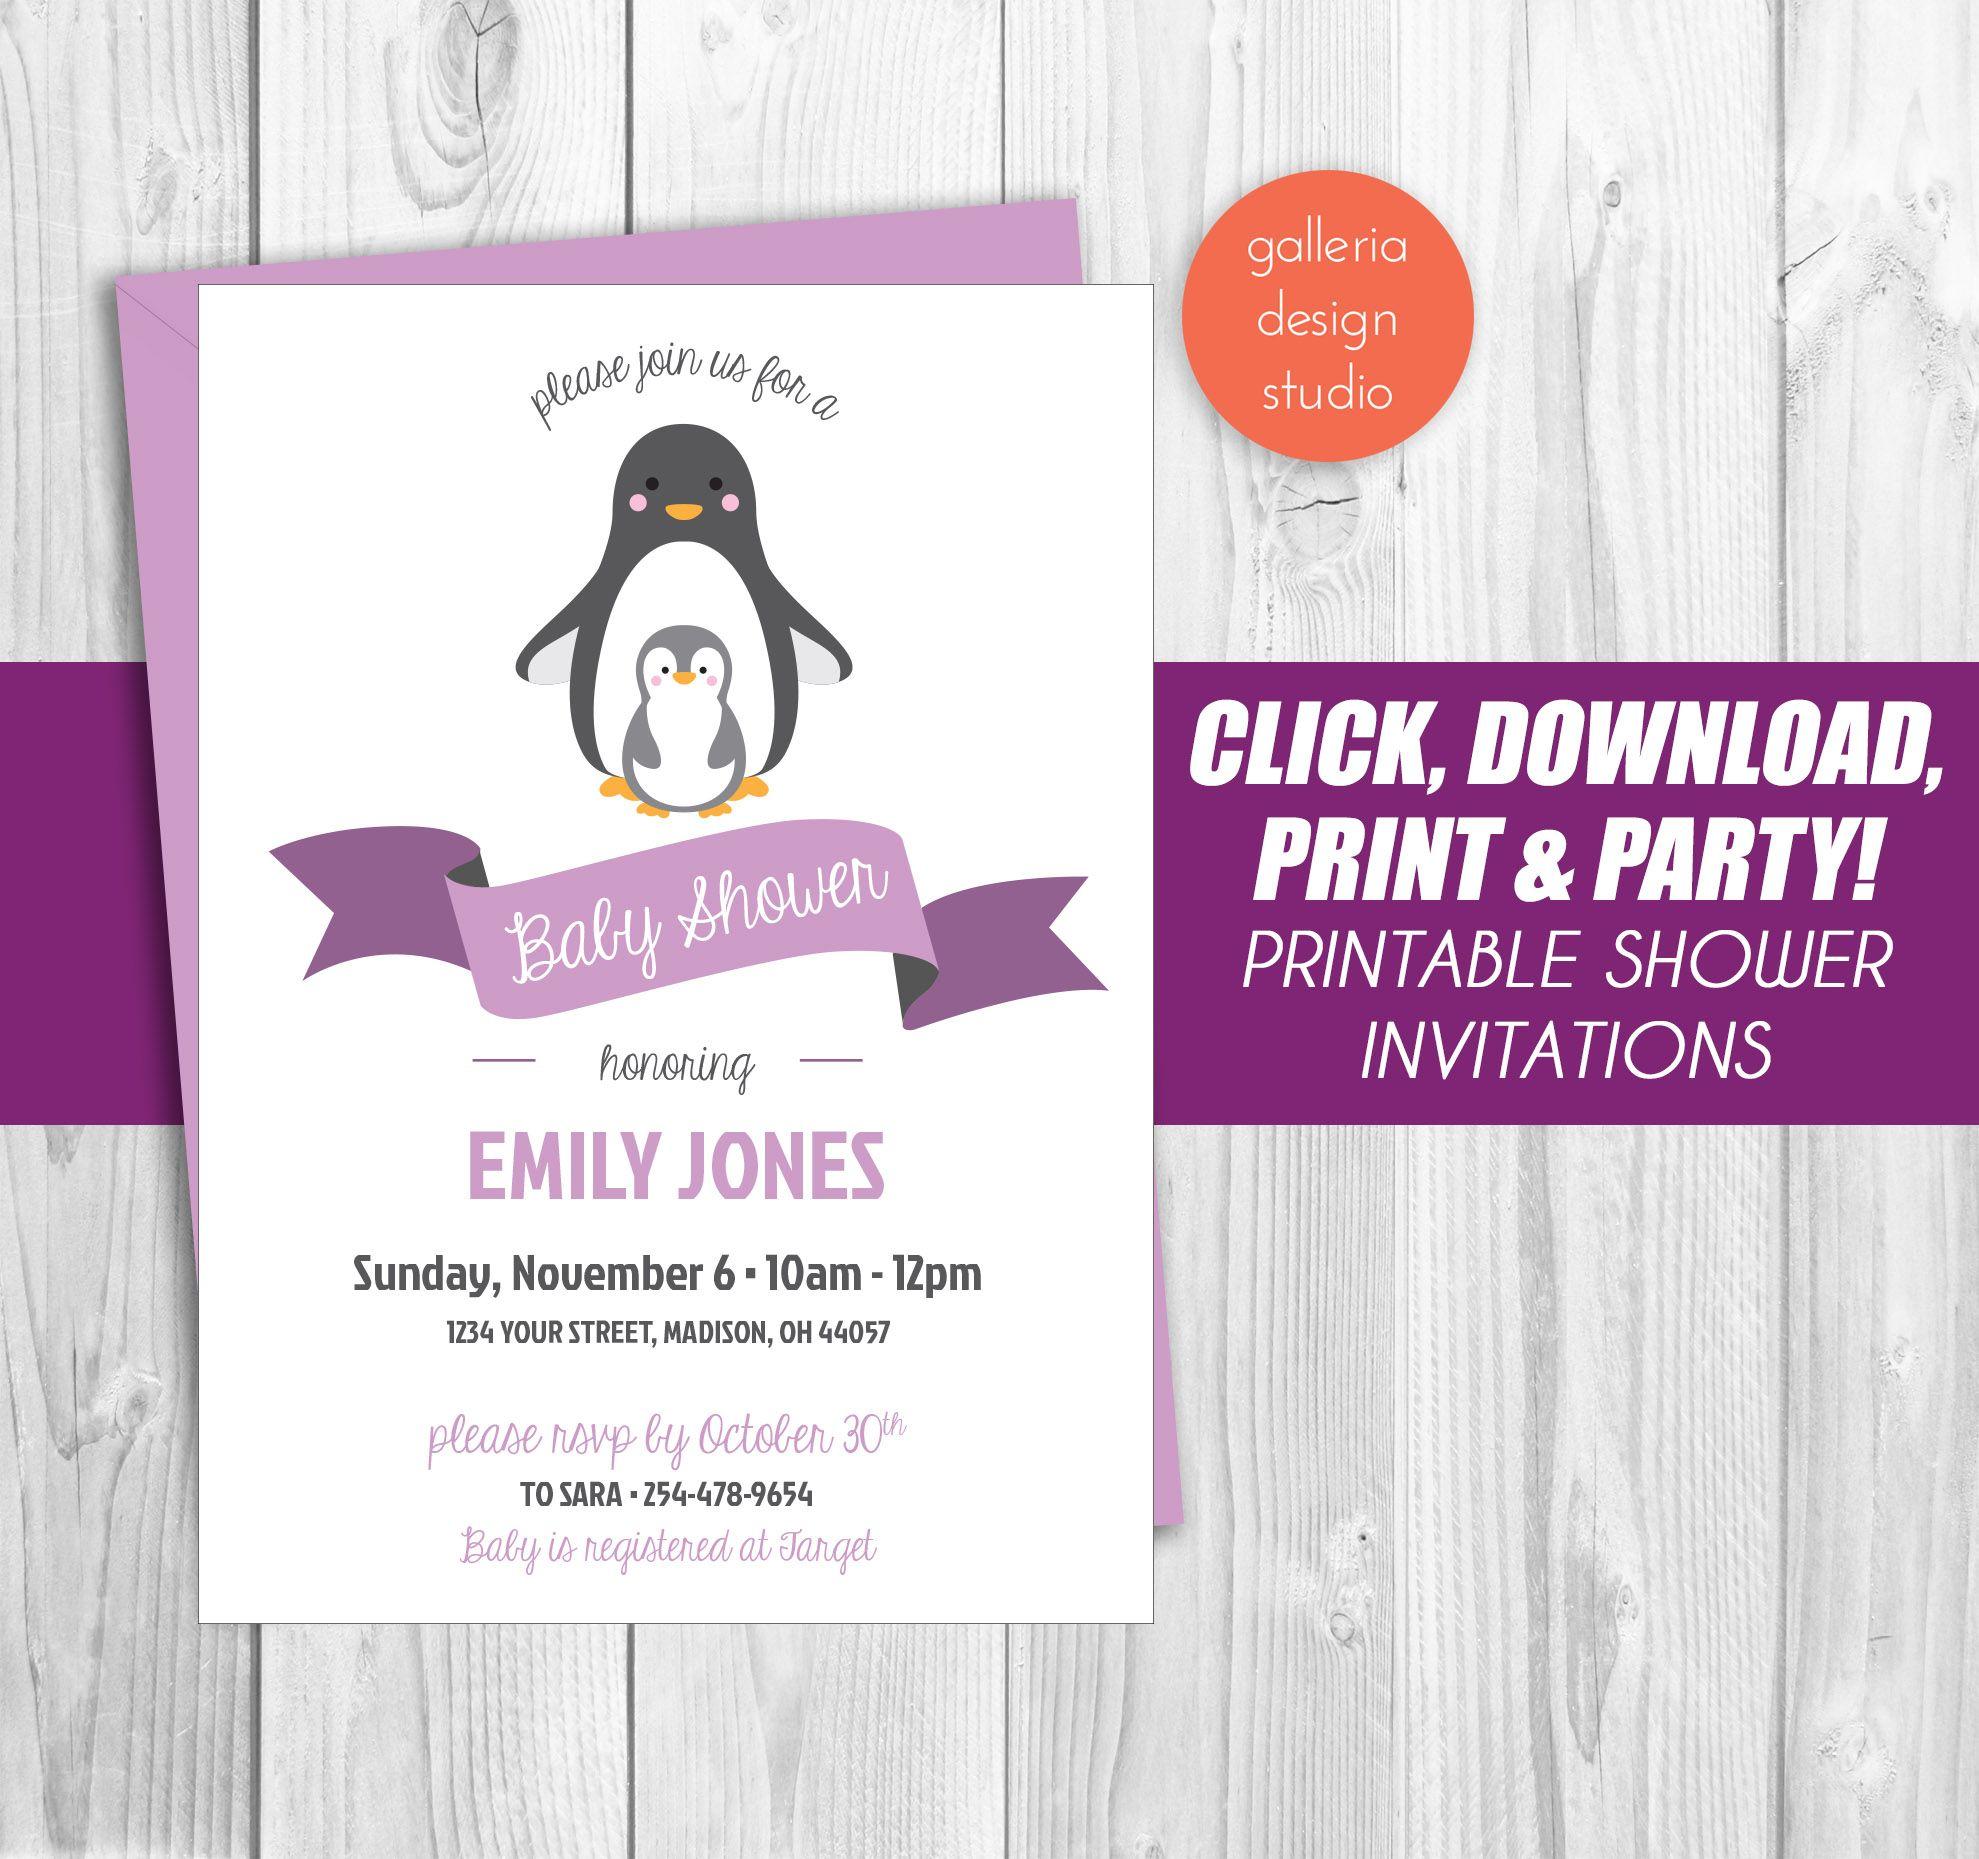 $10 - Purple Penguin Baby Shower Invitation - customizable and ...